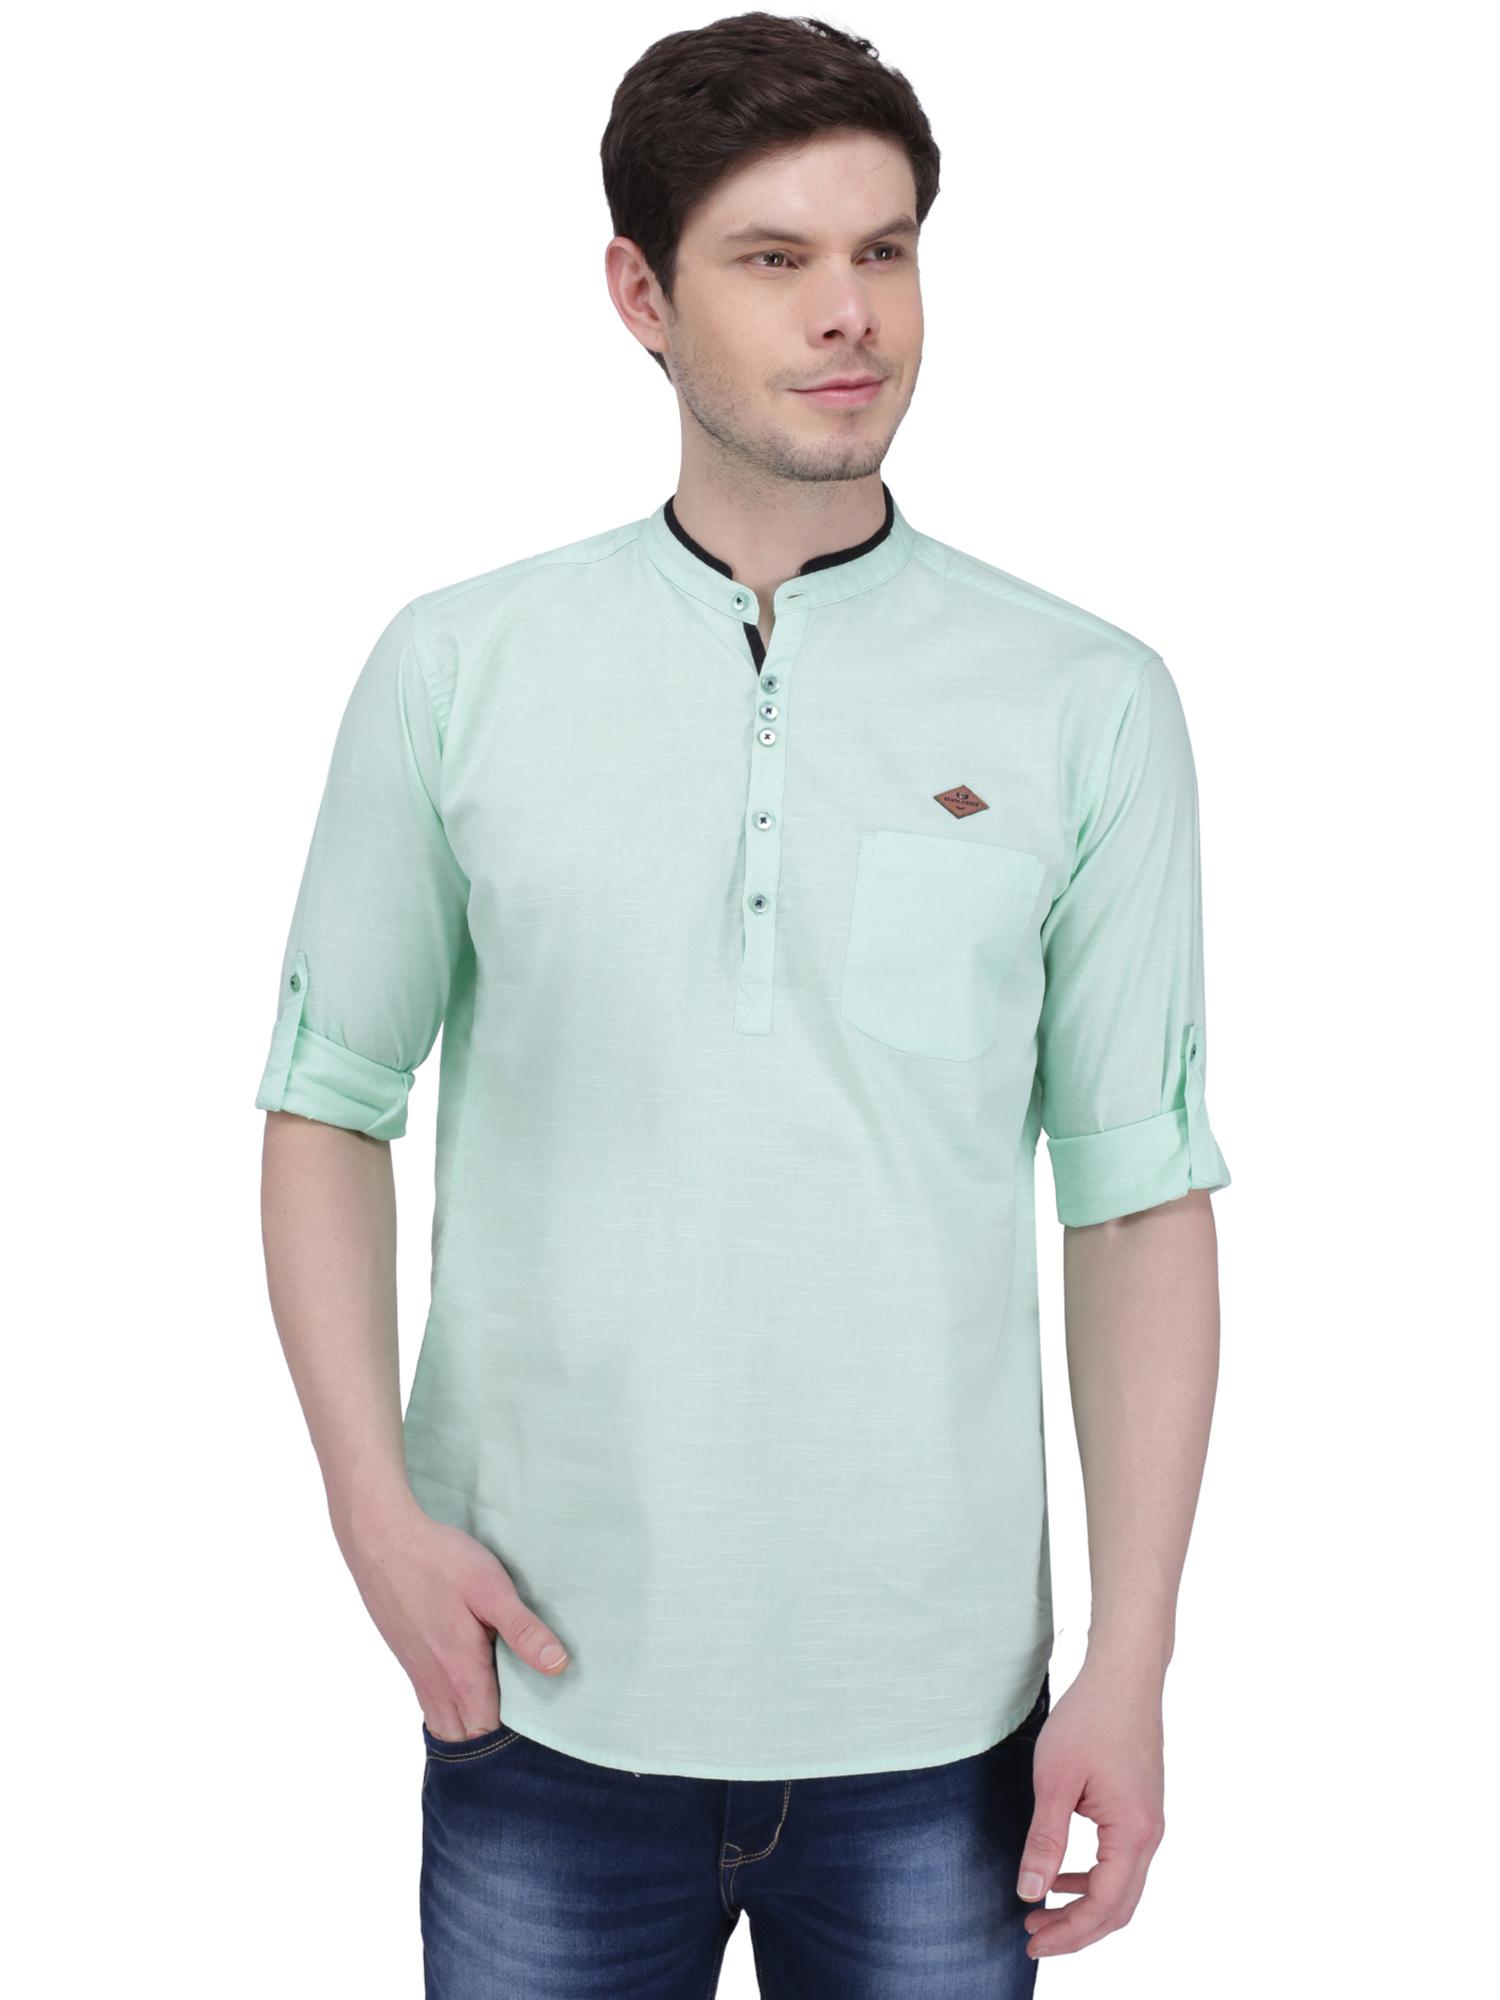 Kuons Avenue | Kuons Avenue Men's Candy Green Linen Cotton Short Kurta- KACLFS1316GY